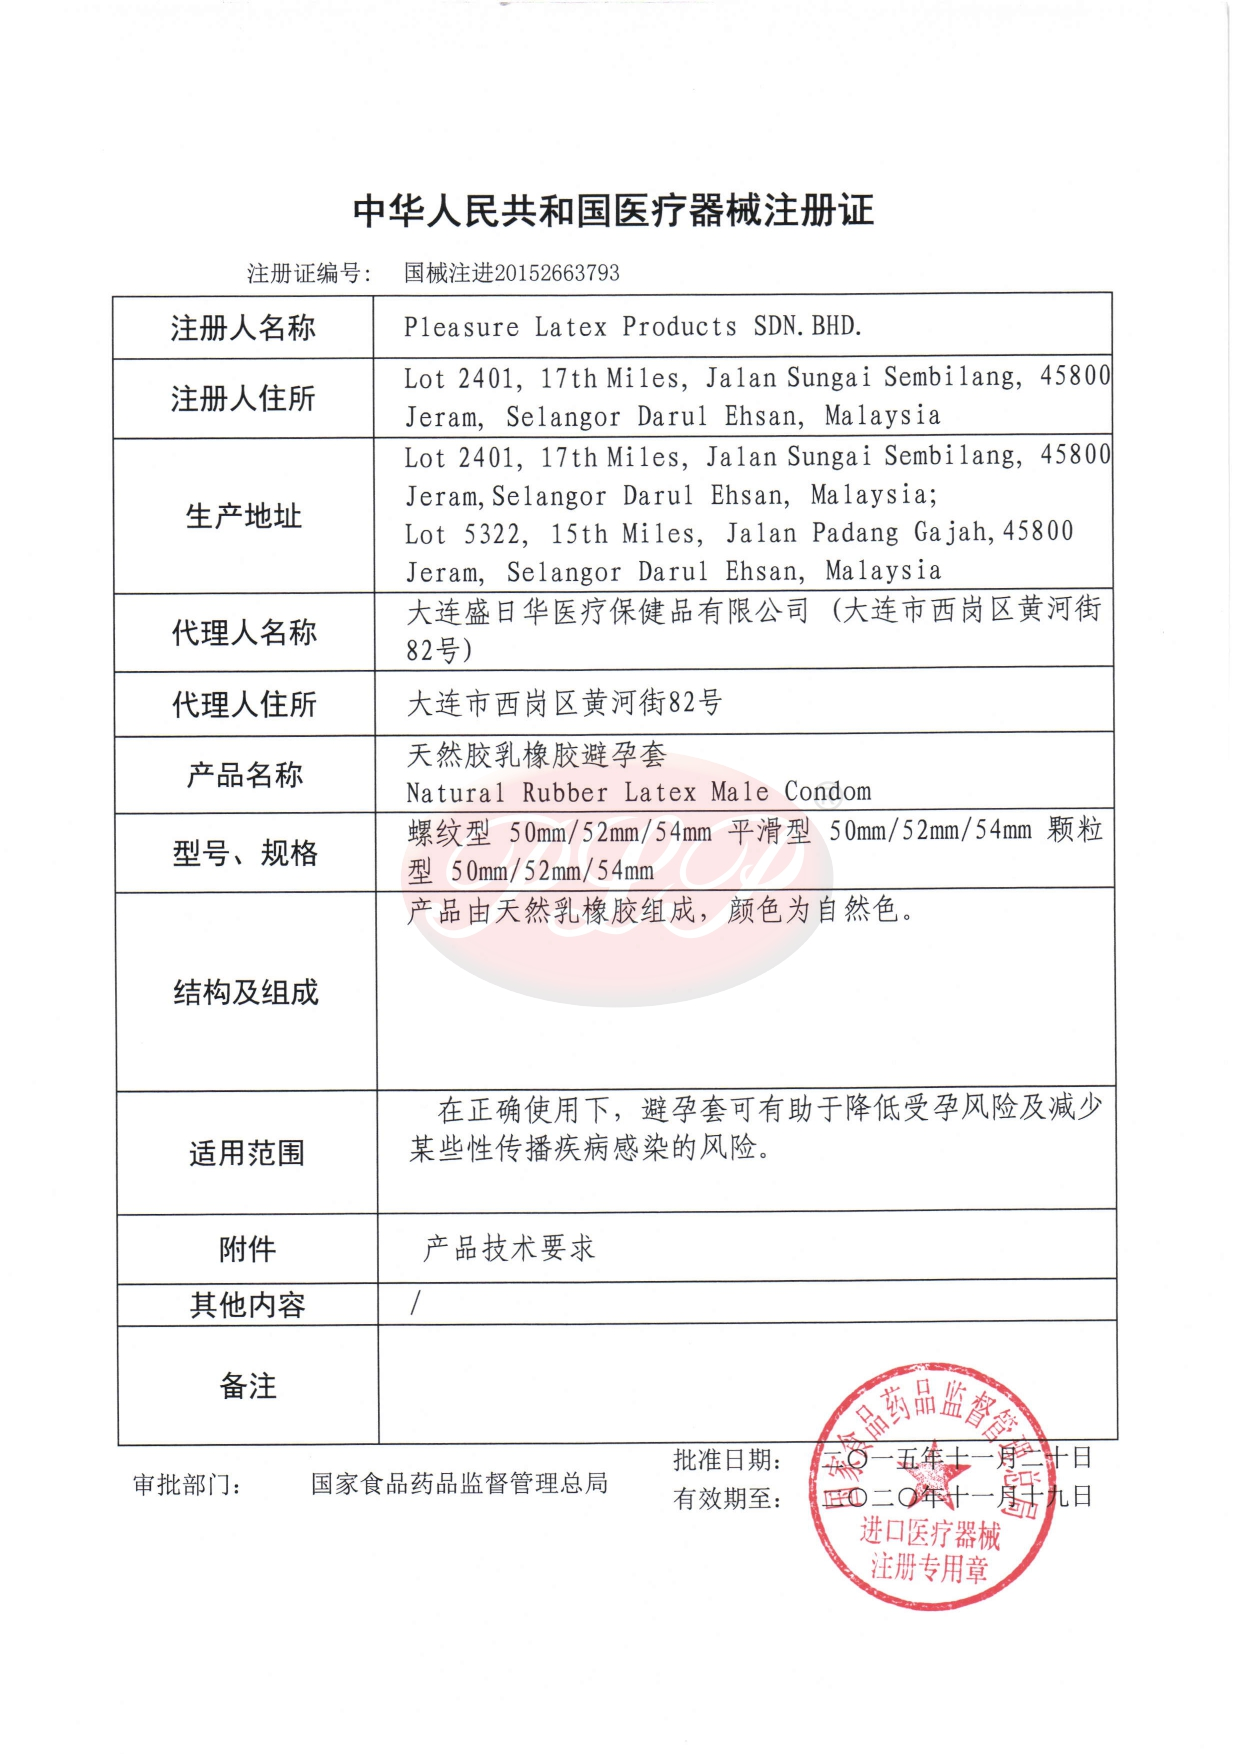 CFDA China Certificate for Male Latex Condom